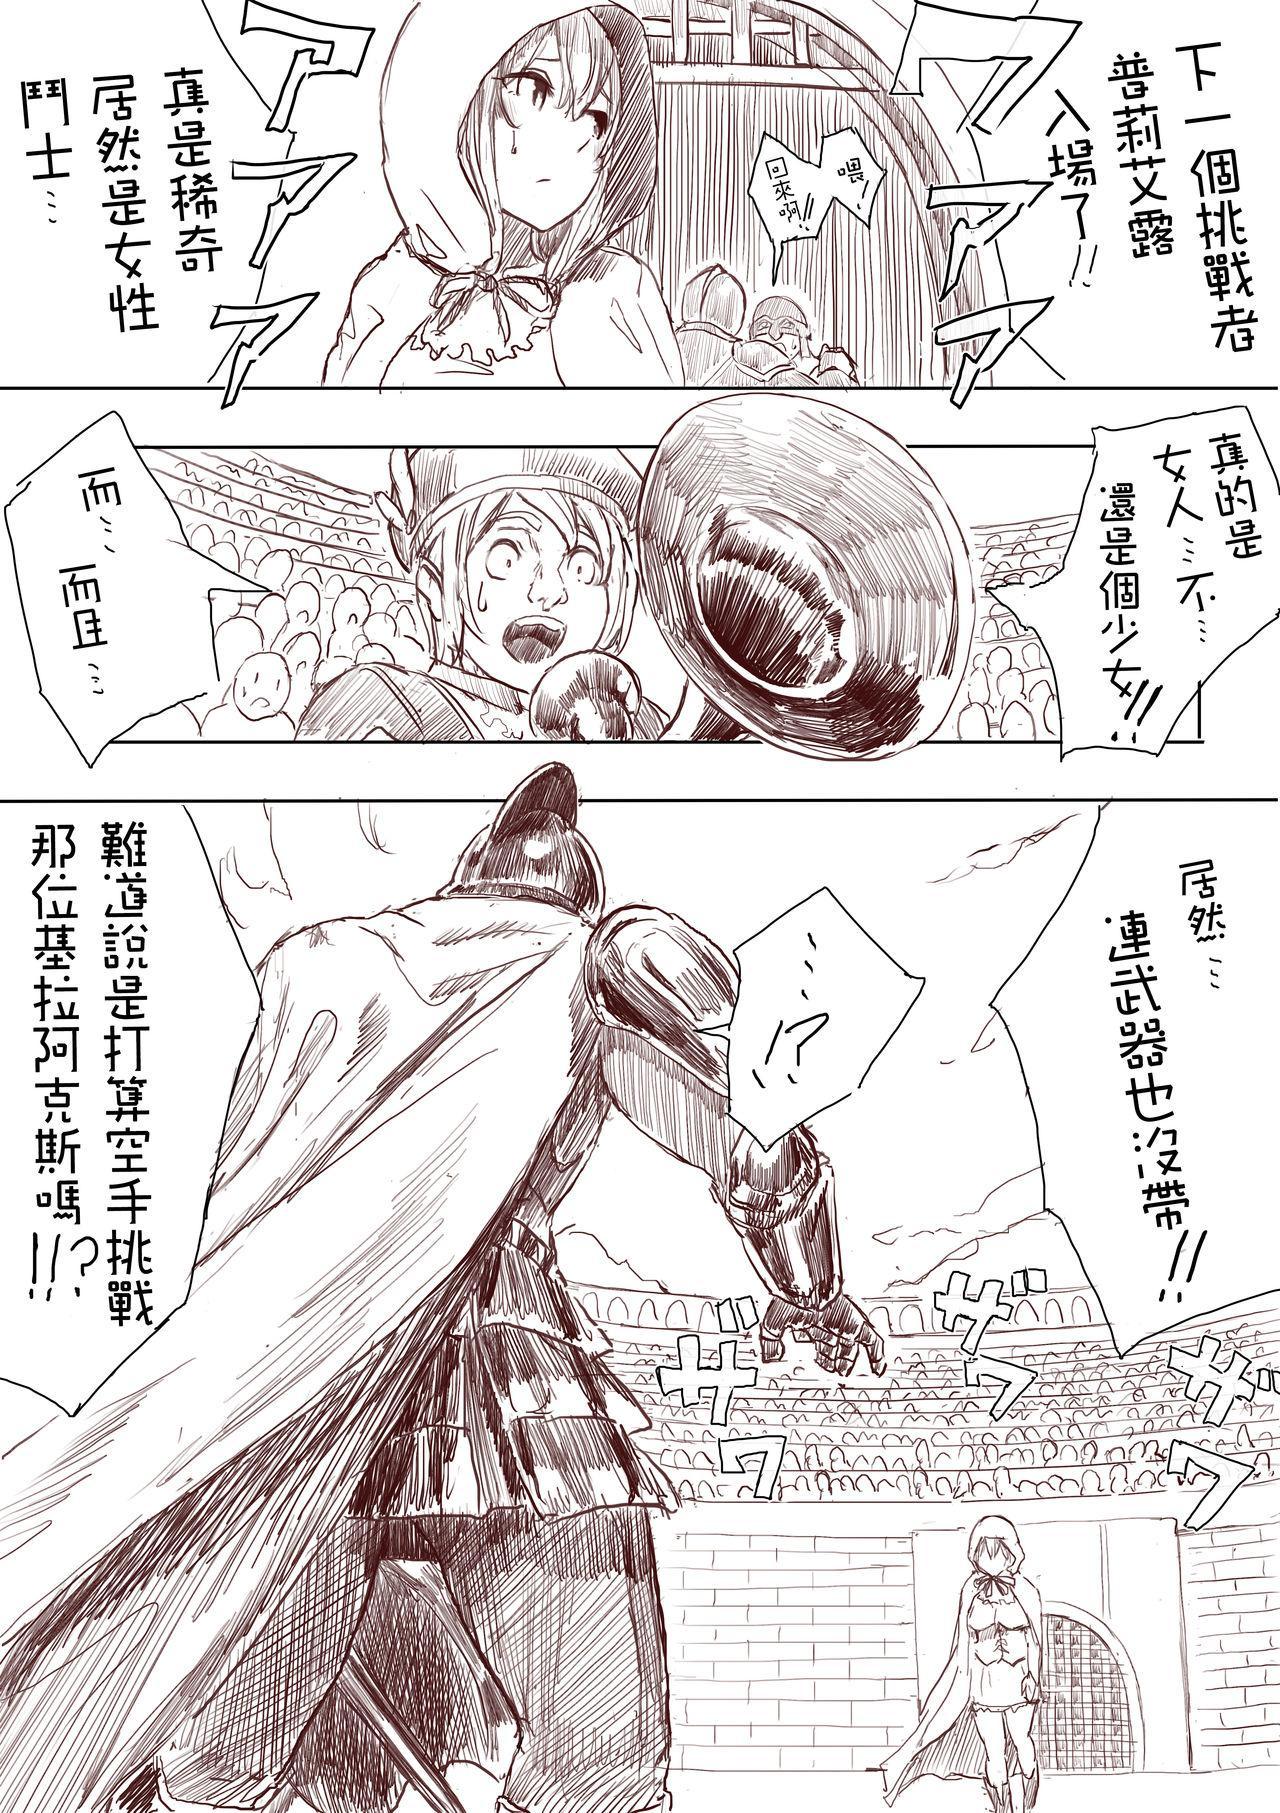 Elf Princess Strikes Back Part1 5